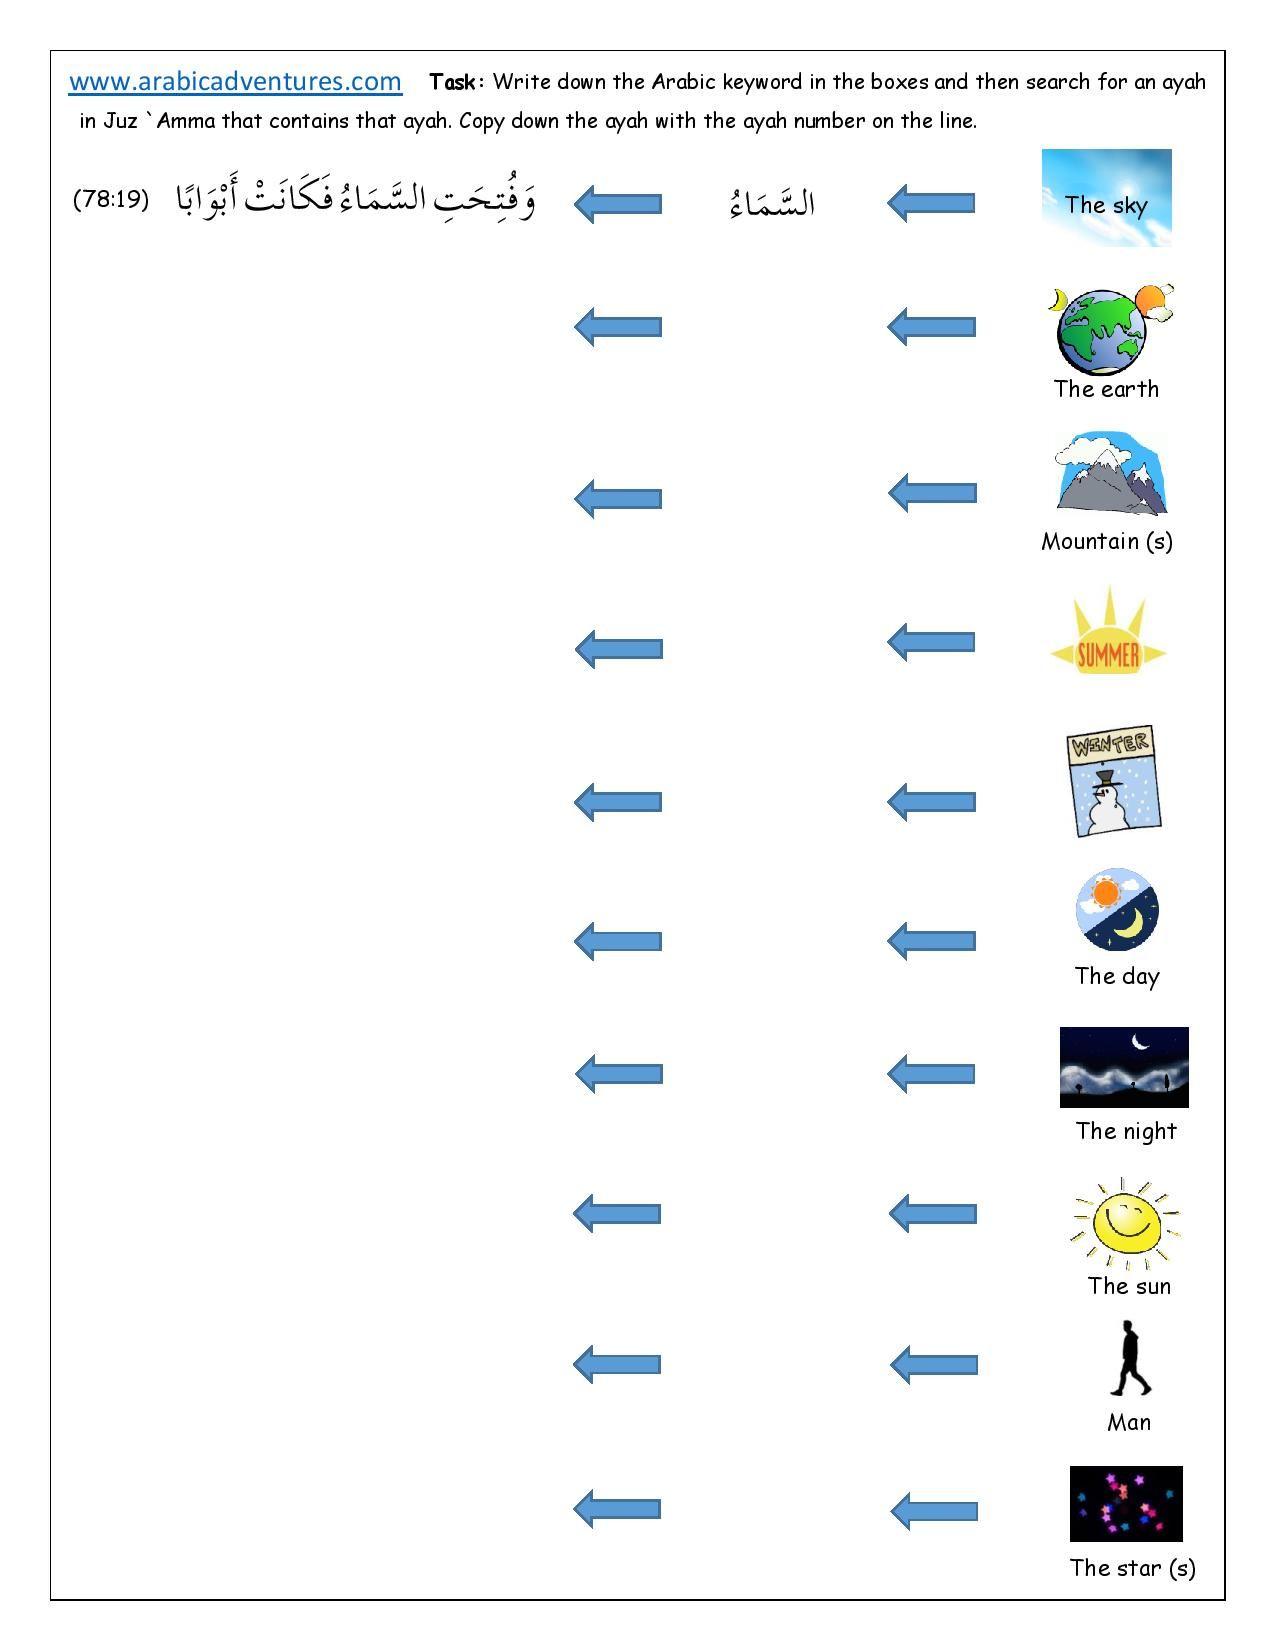 Science 9 Worksheets Excel Quranic Arabic Keywords Worksheet  Quran  Pinterest  Worksheets Adding Fractions Worksheets With Answers with Letter B Worksheets For Preschool Quranic Arabic Keywords Worksheet Reading Comprehension Worksheet Grade 1 Word